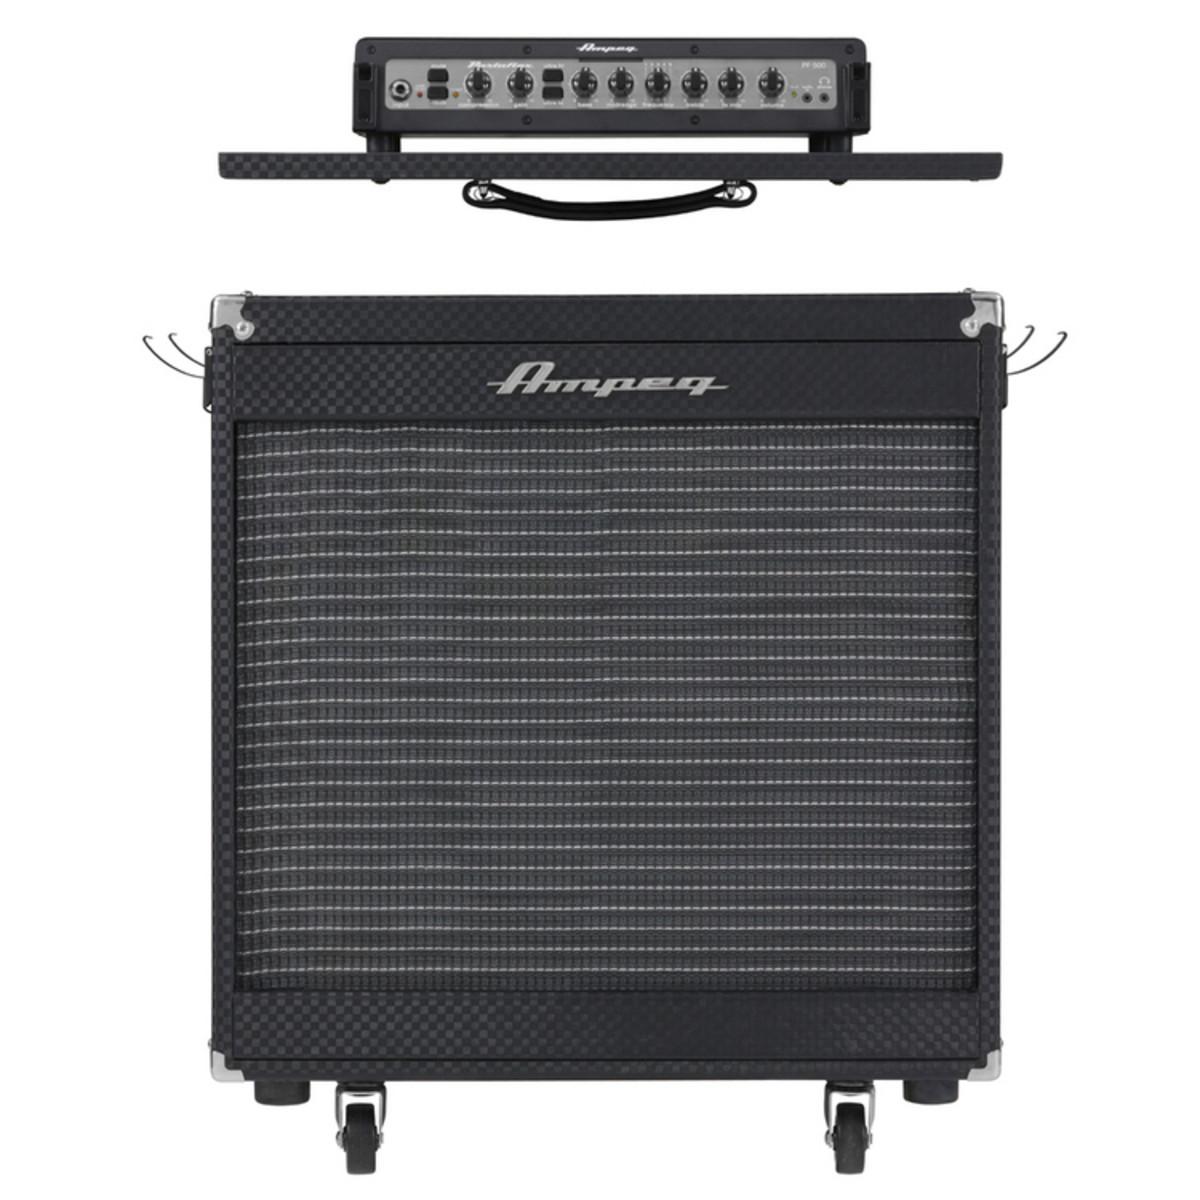 ampeg portaflex pf 500 bass amp 210 cab at. Black Bedroom Furniture Sets. Home Design Ideas